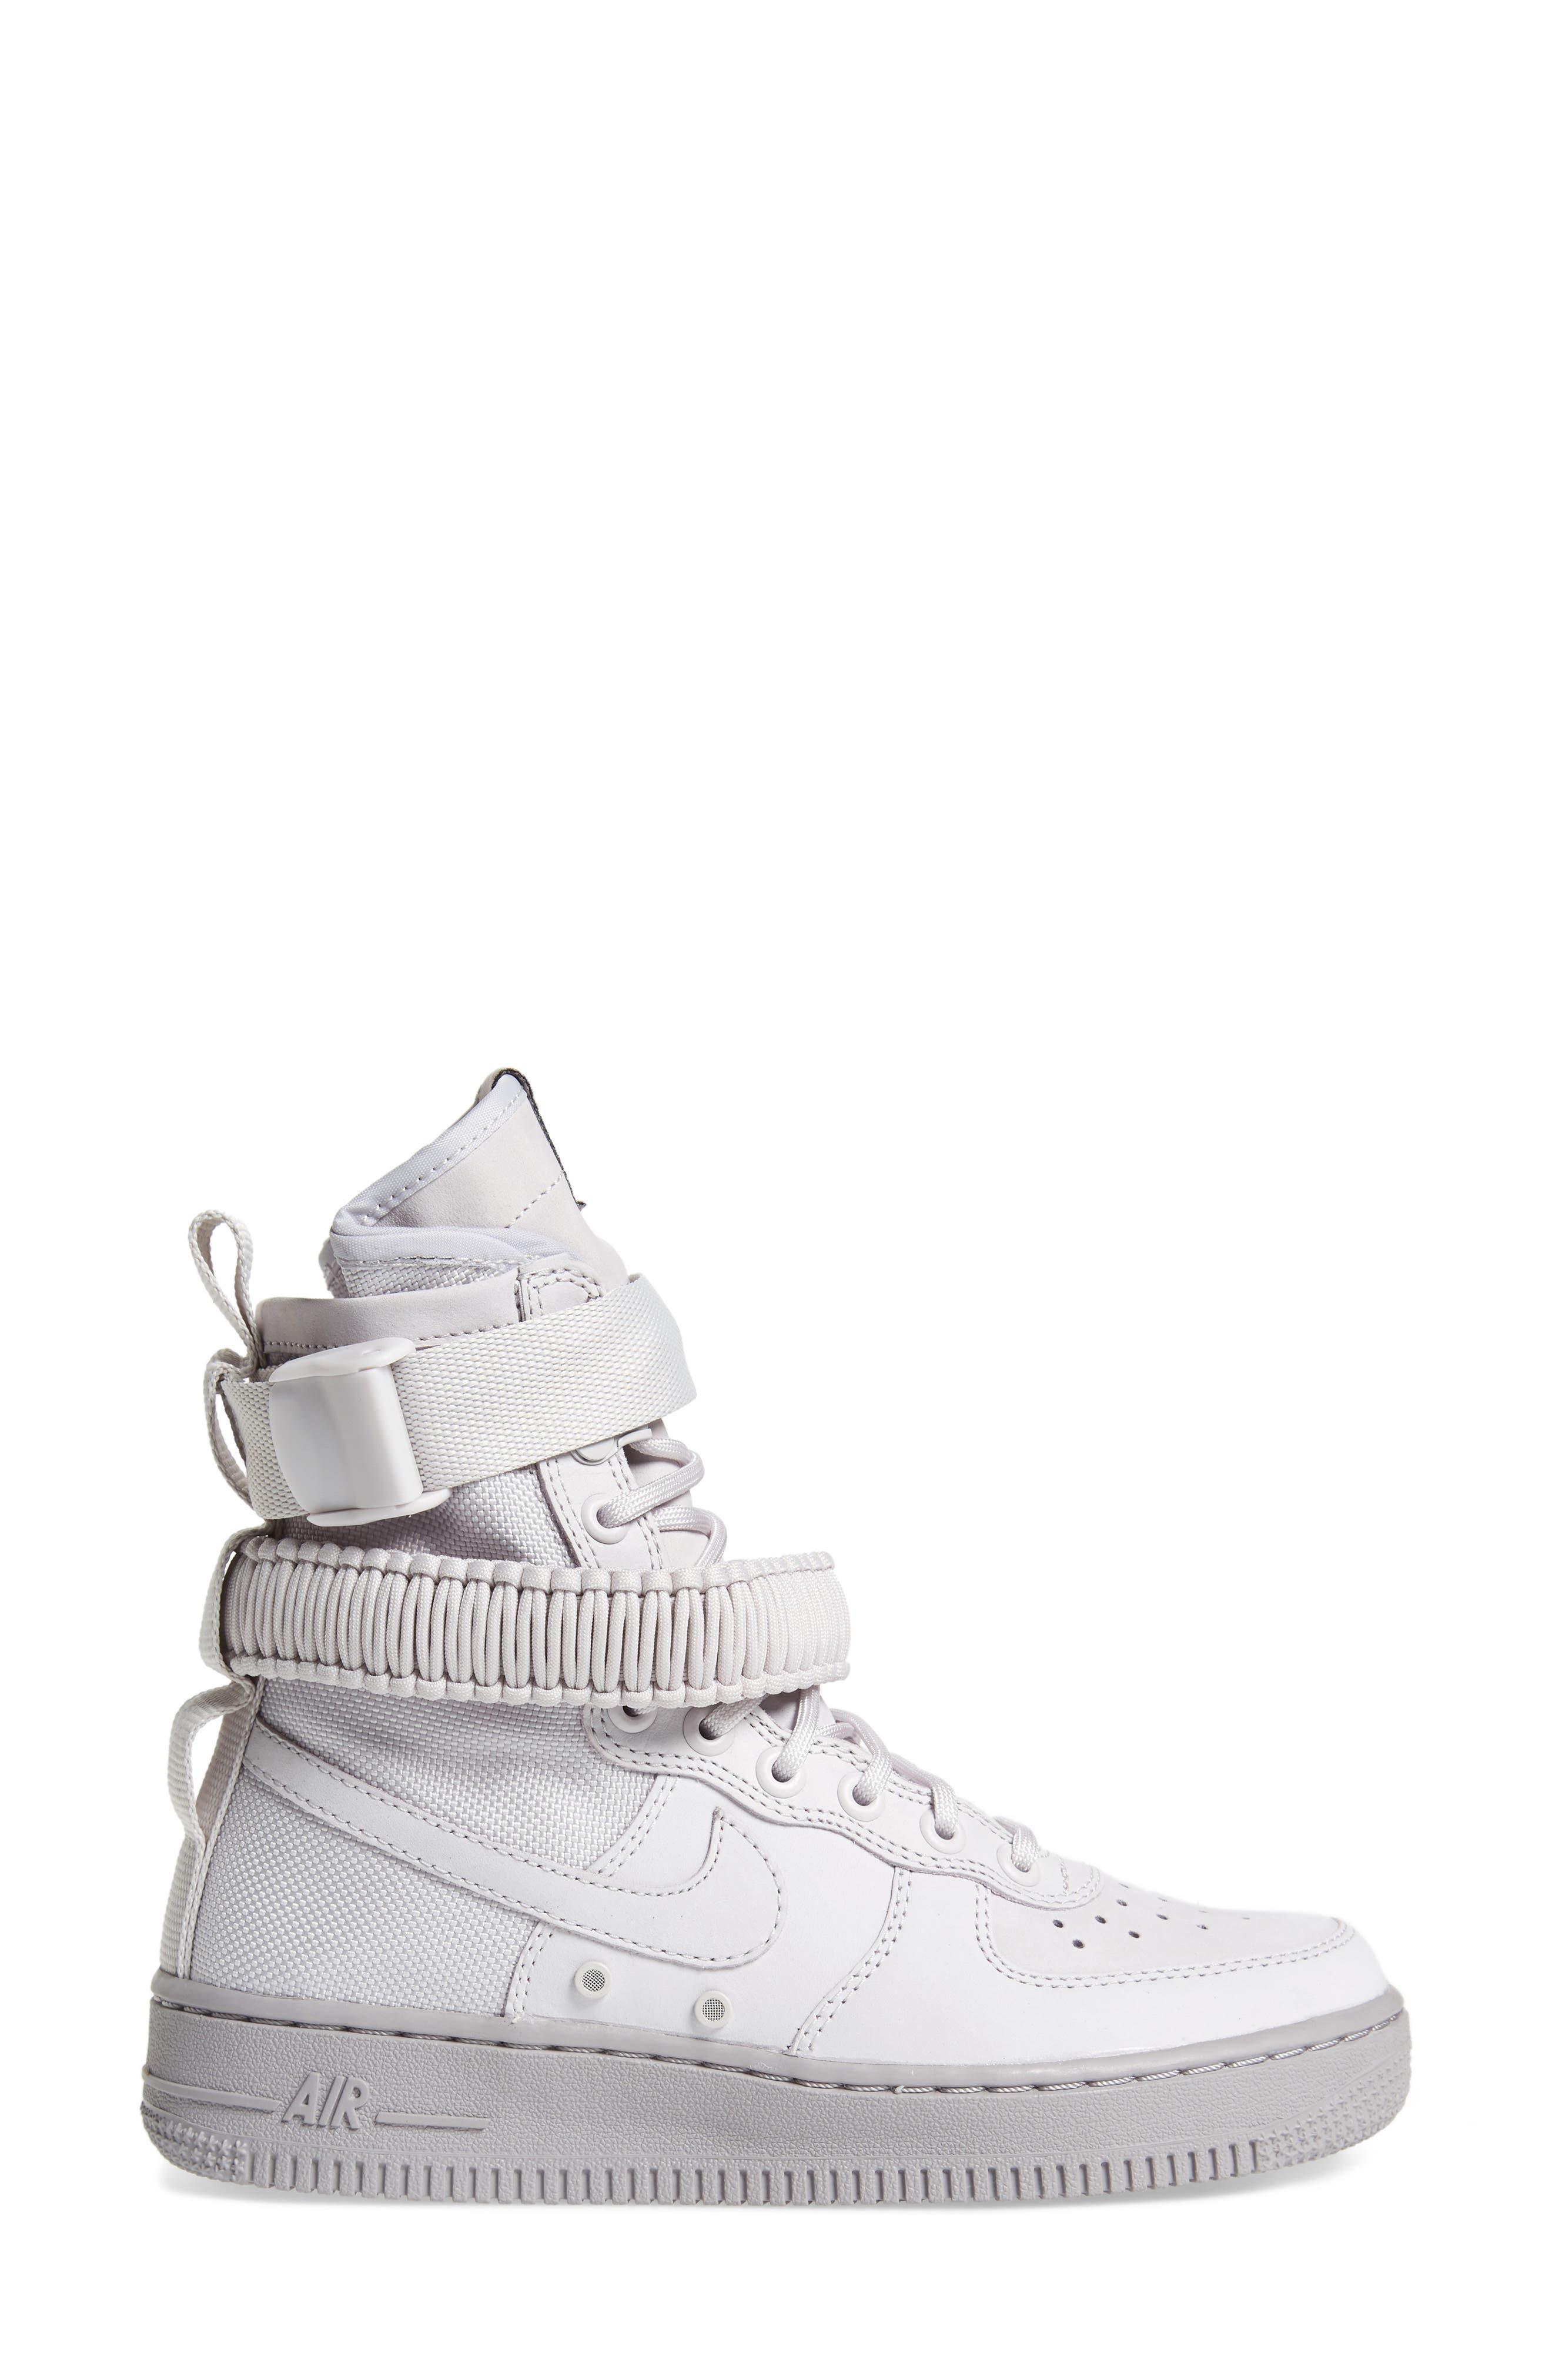 SF Air Force 1 High Top Sneaker,                             Alternate thumbnail 3, color,                             Vast Grey/ Vast Grey